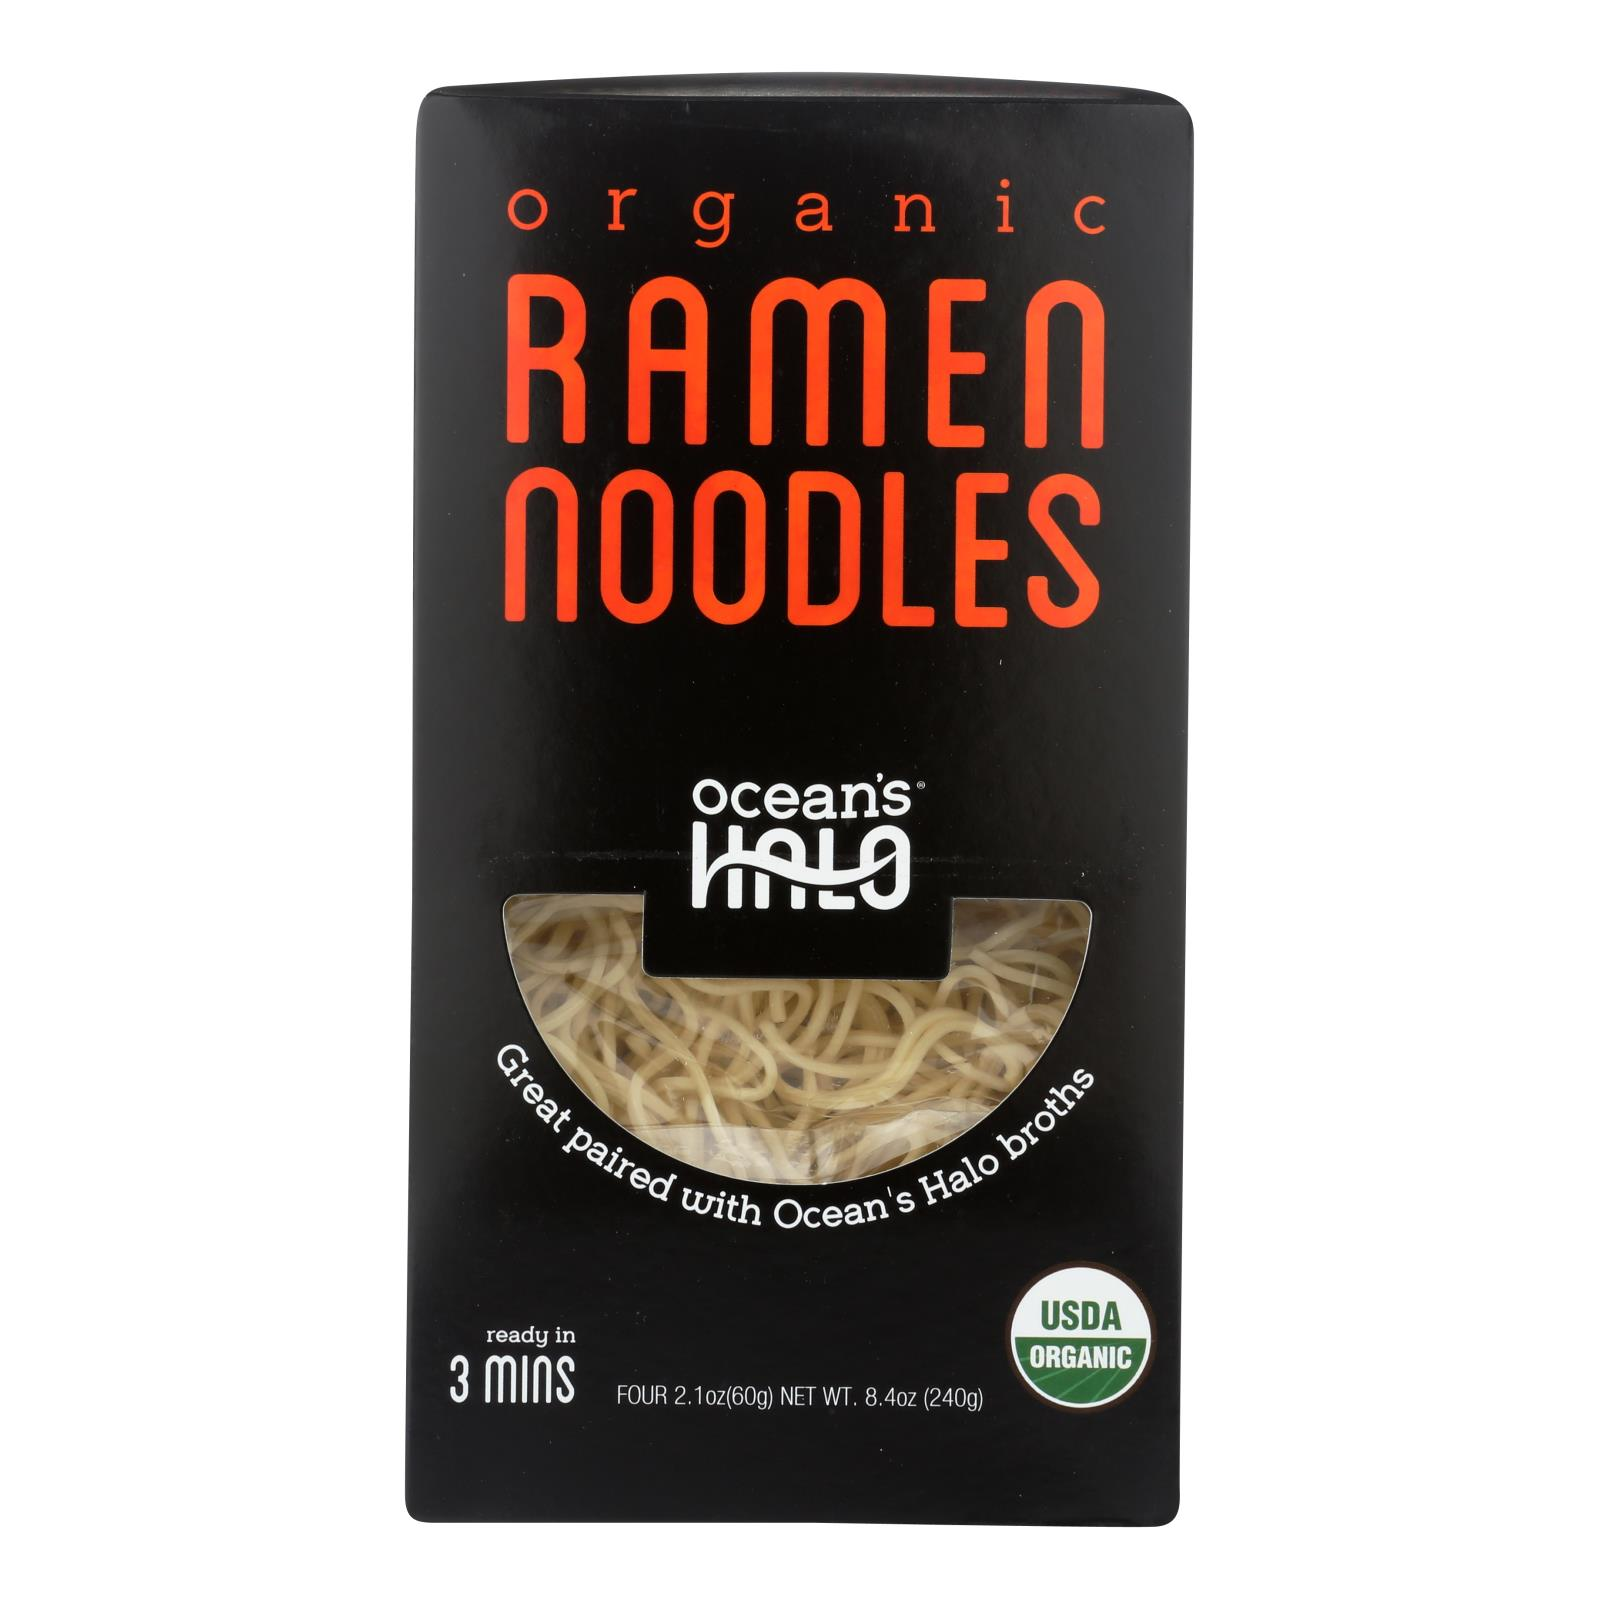 Ocean's Halo Organic Ramen Noodles - Case of 5 - 8.4 OZ